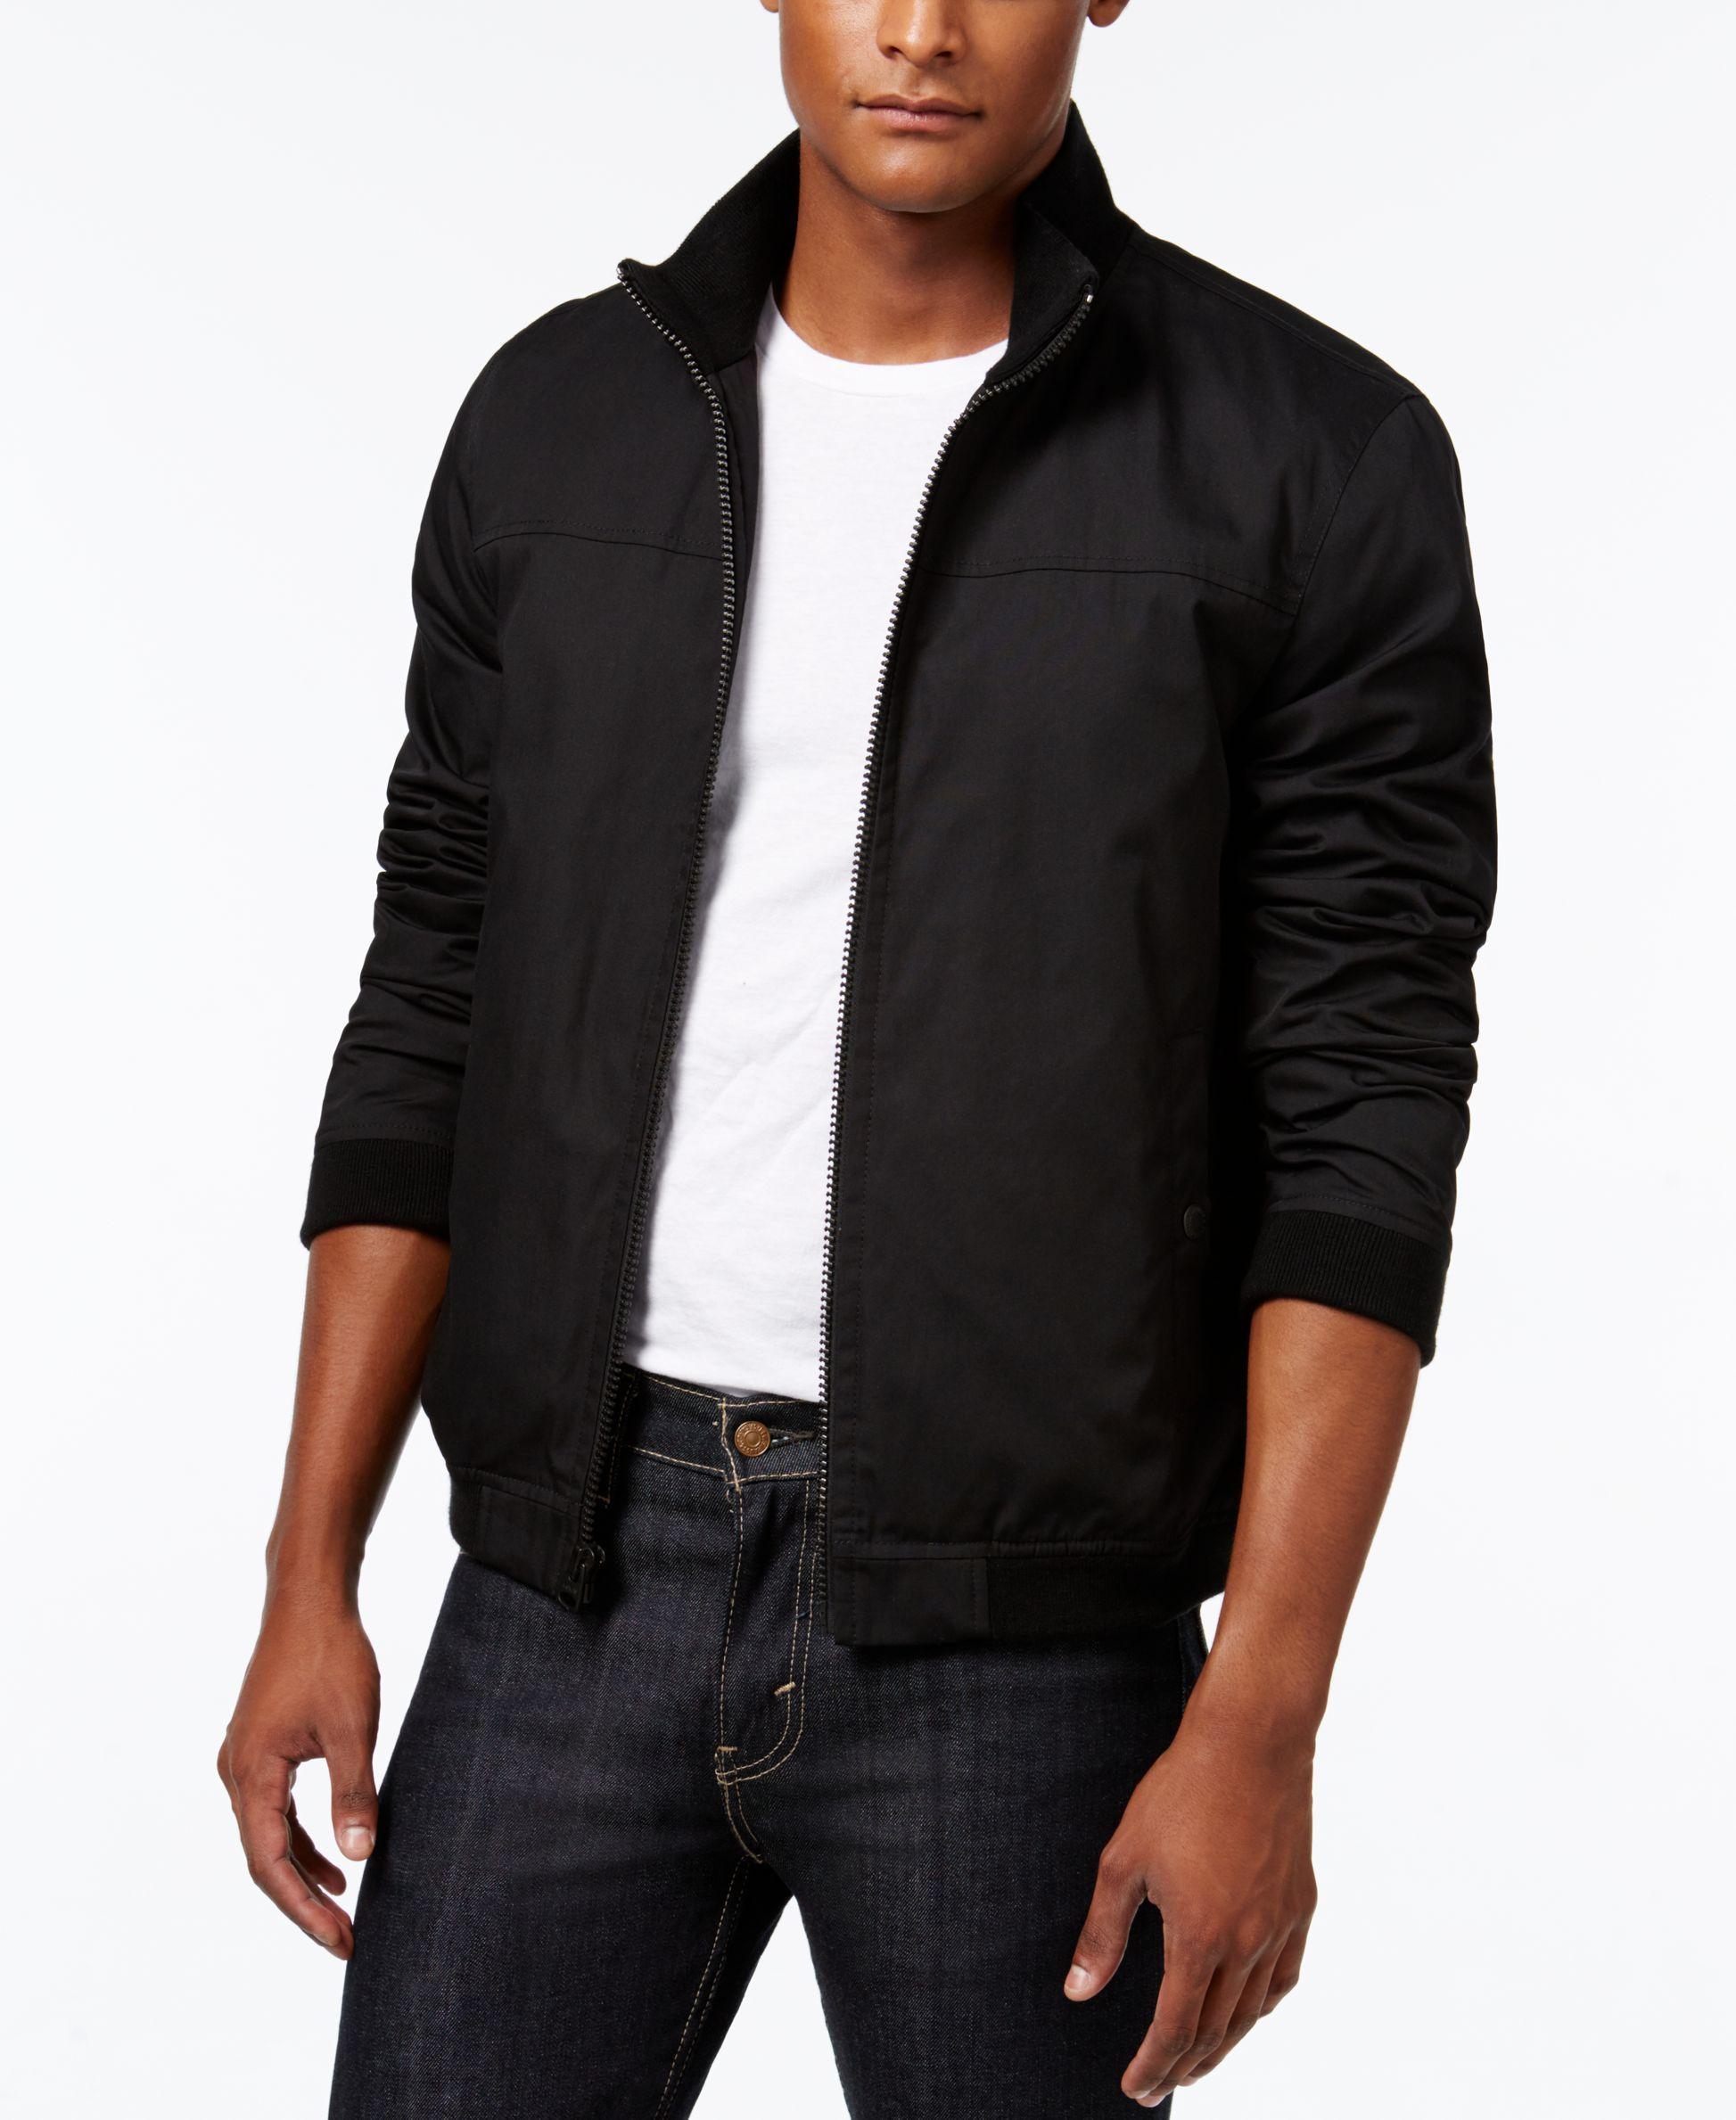 Levi S Men S Cotton Bomber Jacket Coats Jackets Men Macy S Mens Jackets Bomber Jacket Flight Jacket [ 2378 x 1947 Pixel ]